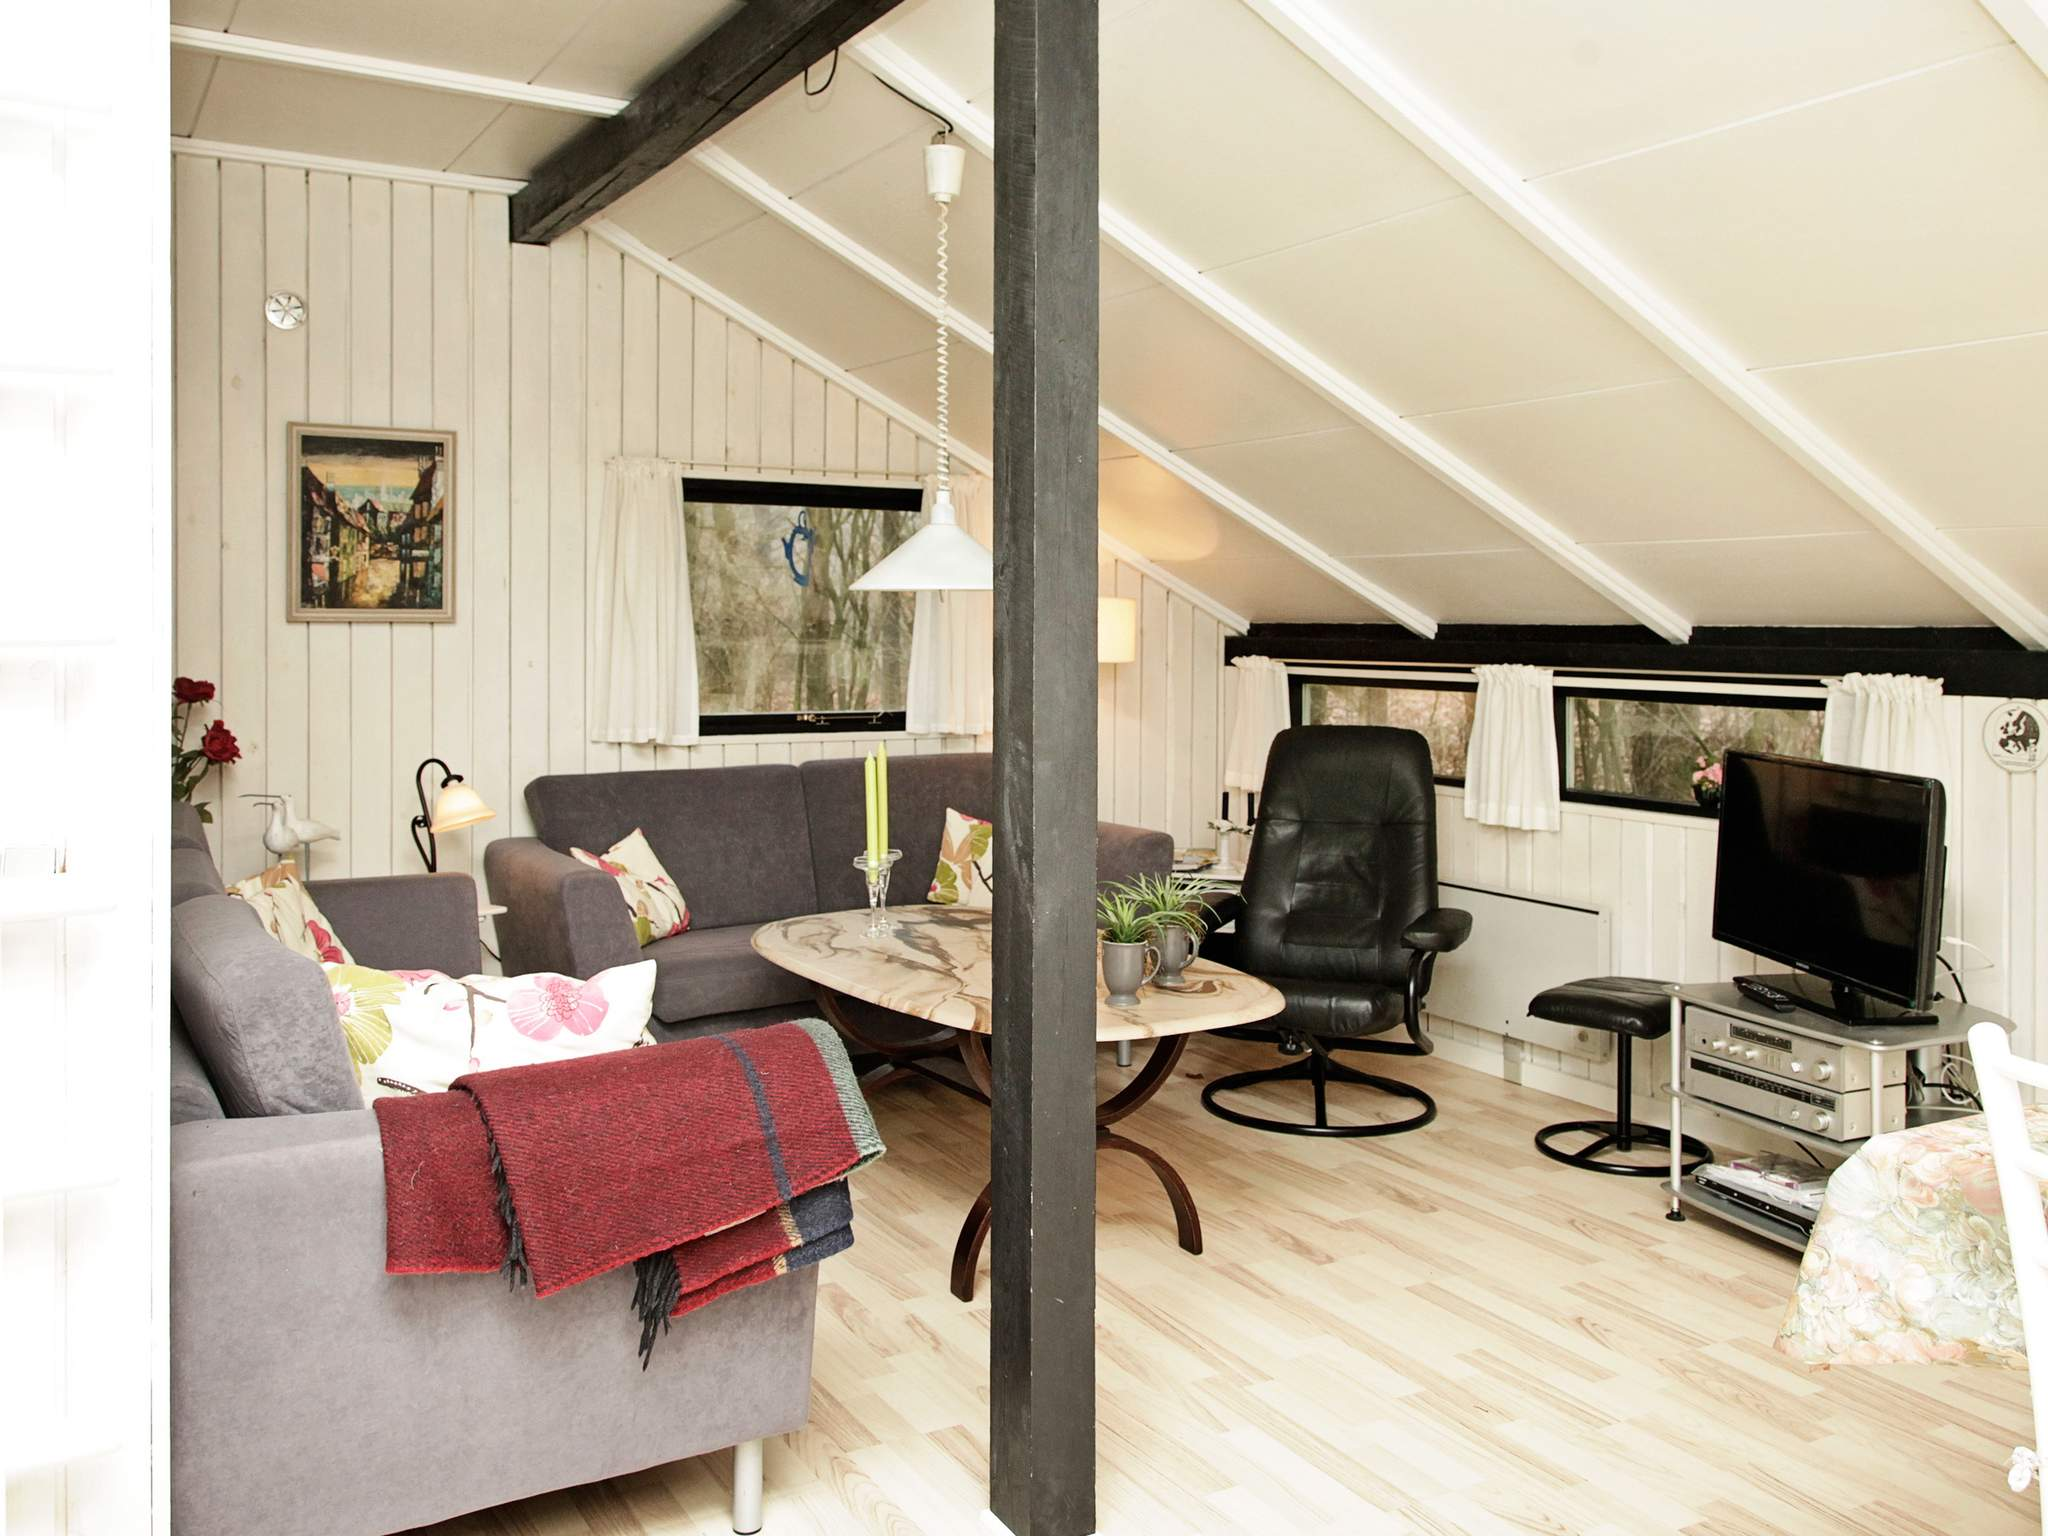 Ferienhaus Arrild (87701), Arrild, , Südwestjütland, Dänemark, Bild 2